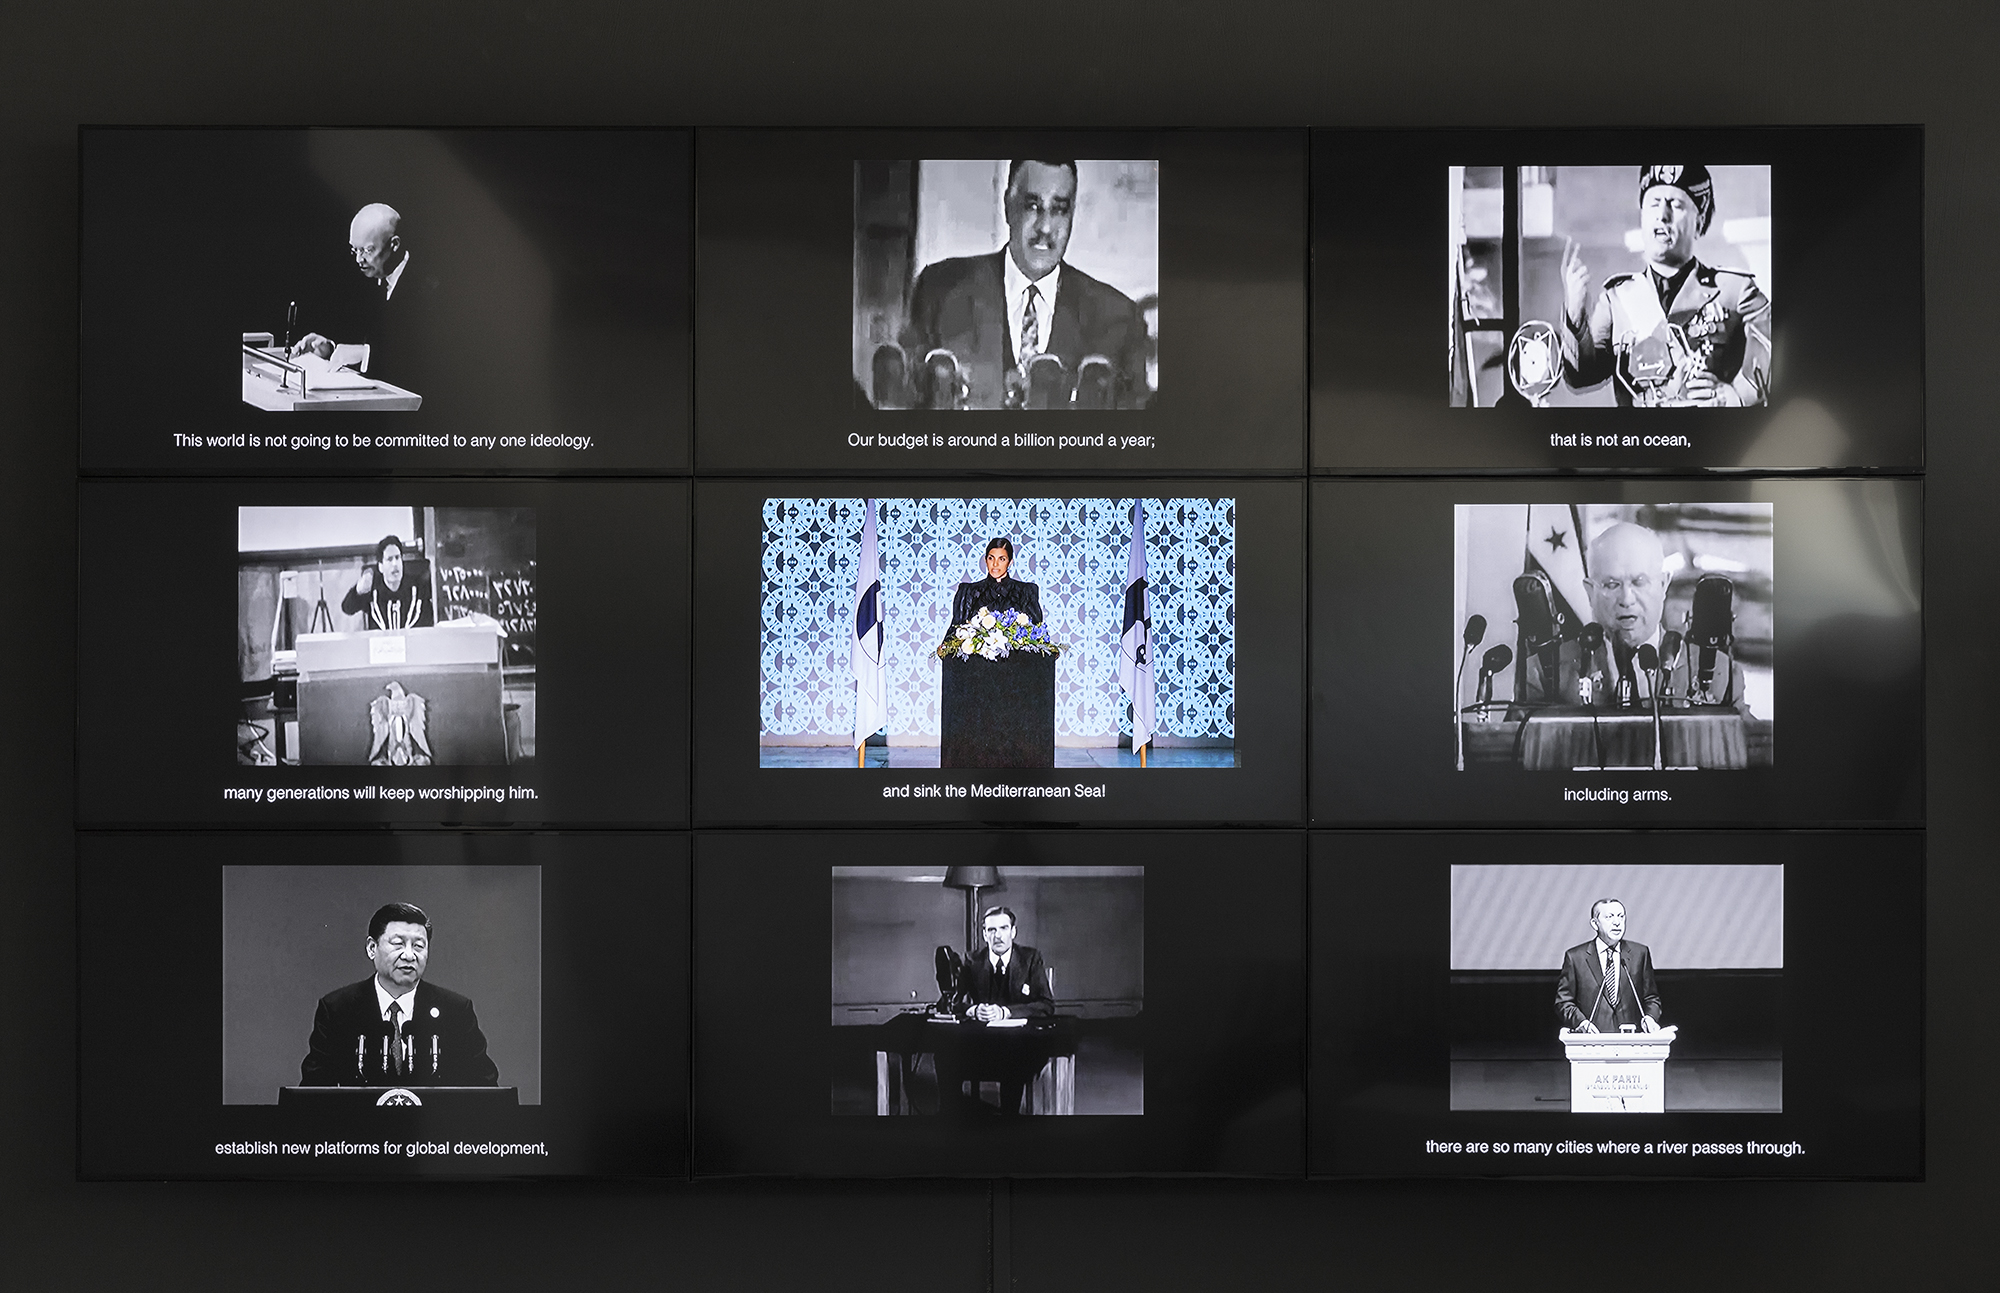 Heba Y. Amin - Operation Sunken Sea, The Anti Control Room. Courtesy of Zilberman Gallery.